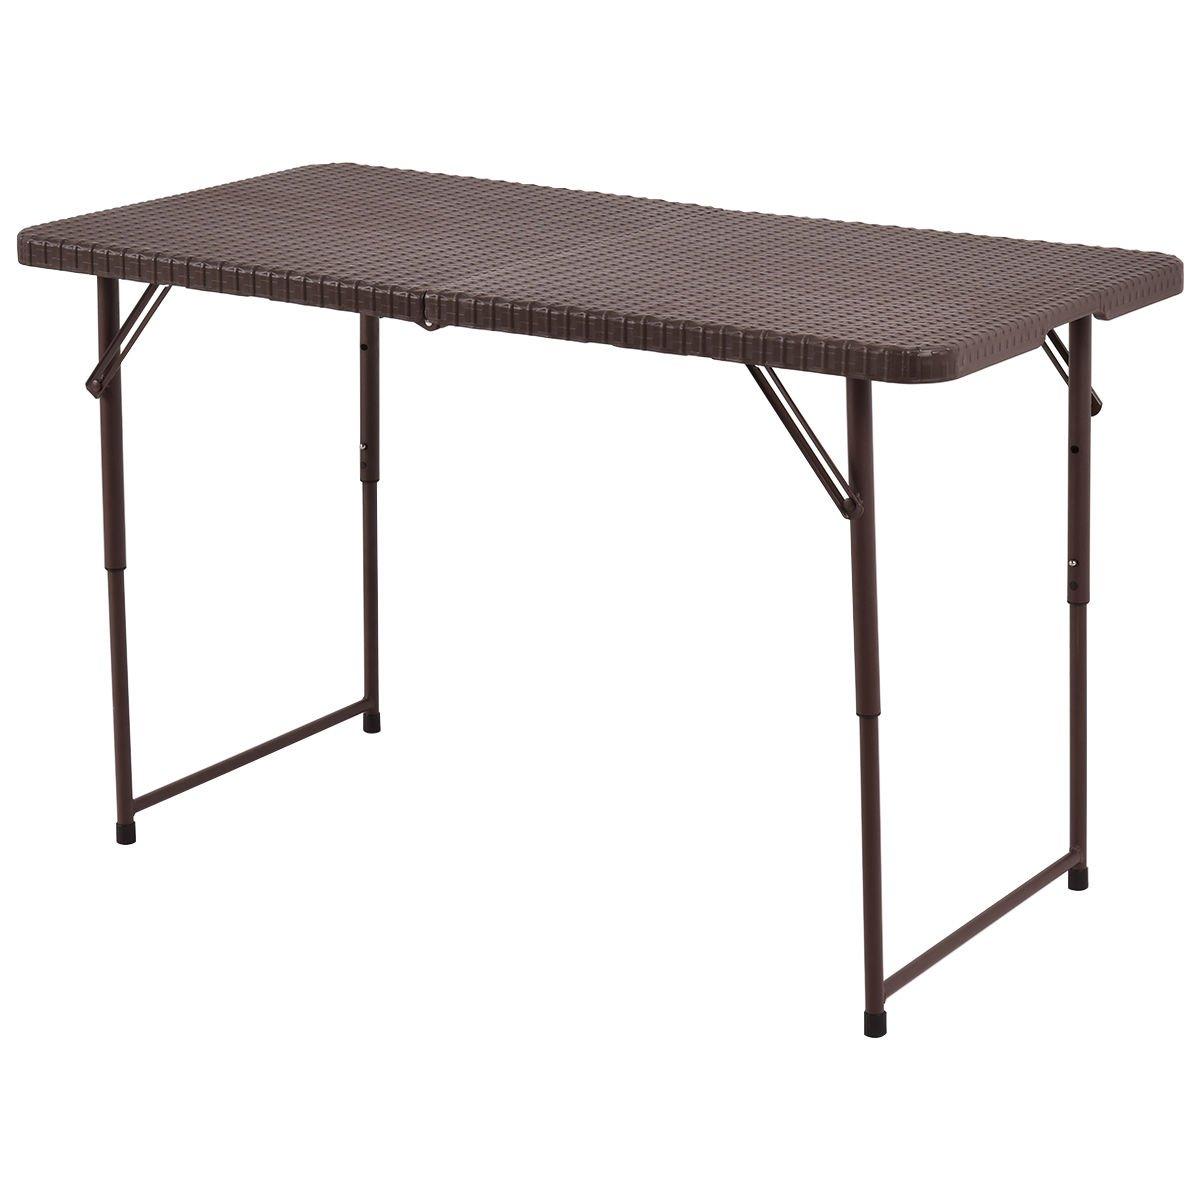 FDInspiration 4FT Brown Portable HDPE Table Folding Rattan Design Adjustable Hight w/Carry Handle